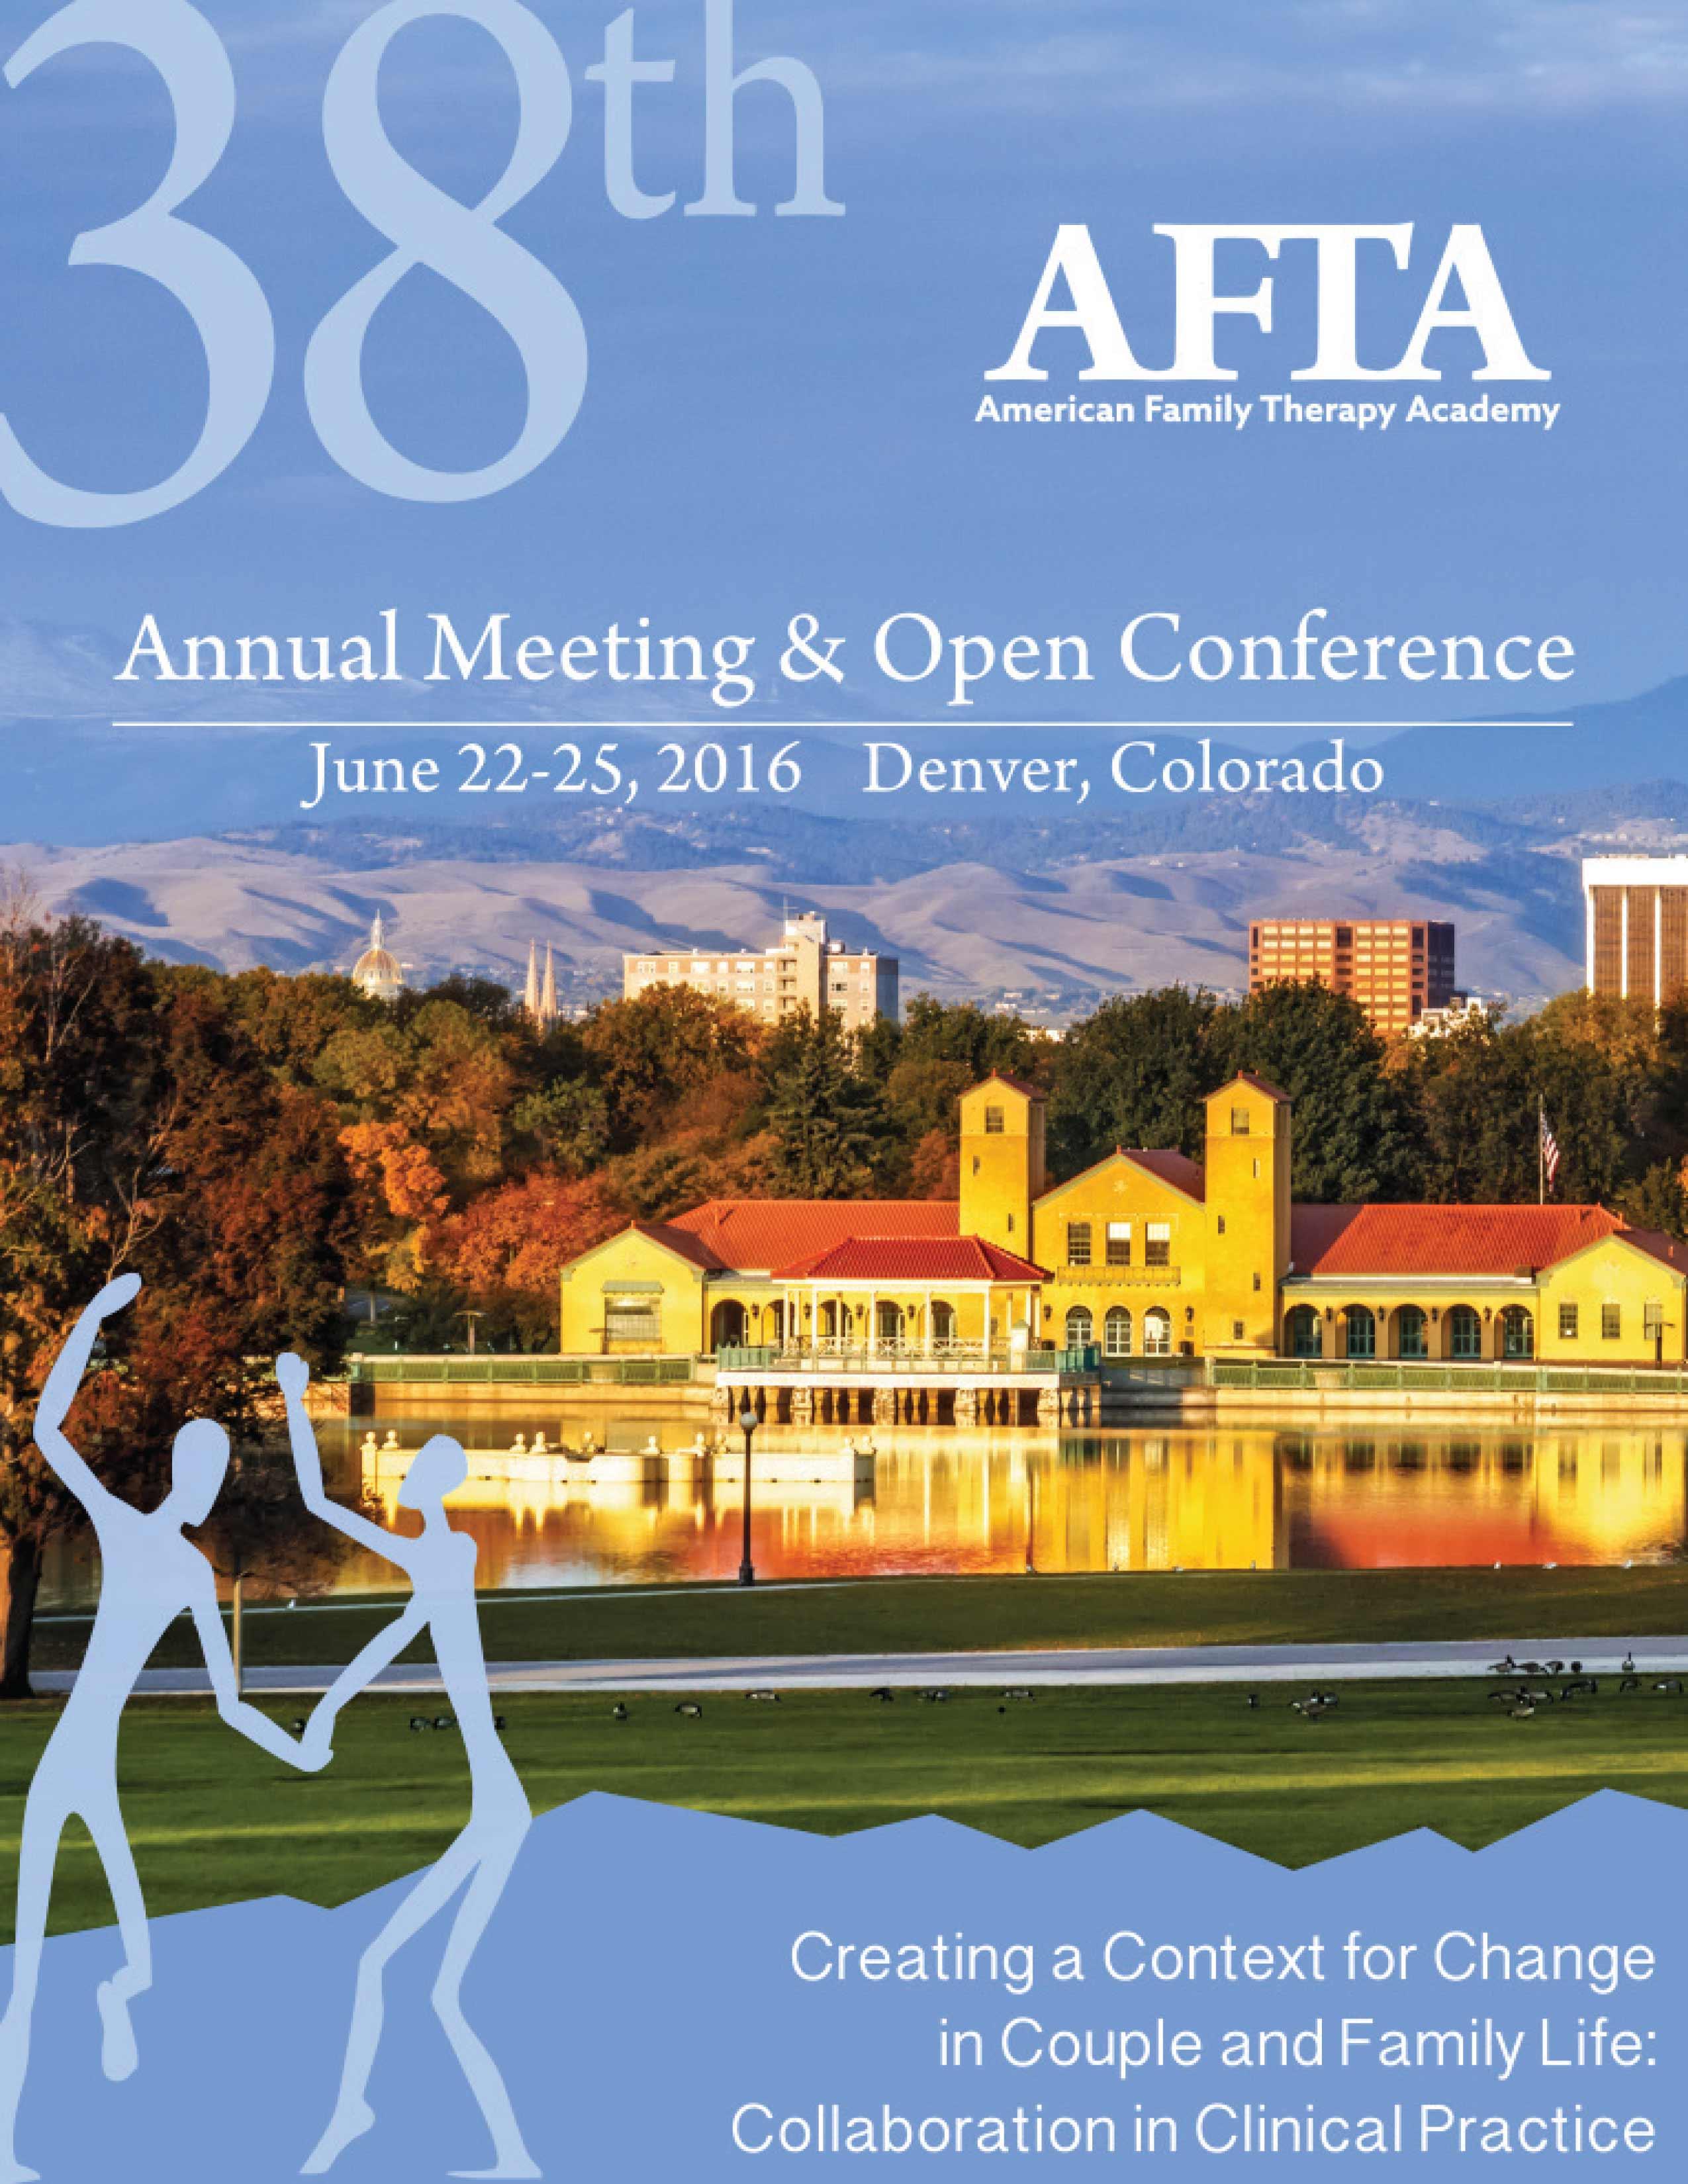 2016 Annual Meeting Program